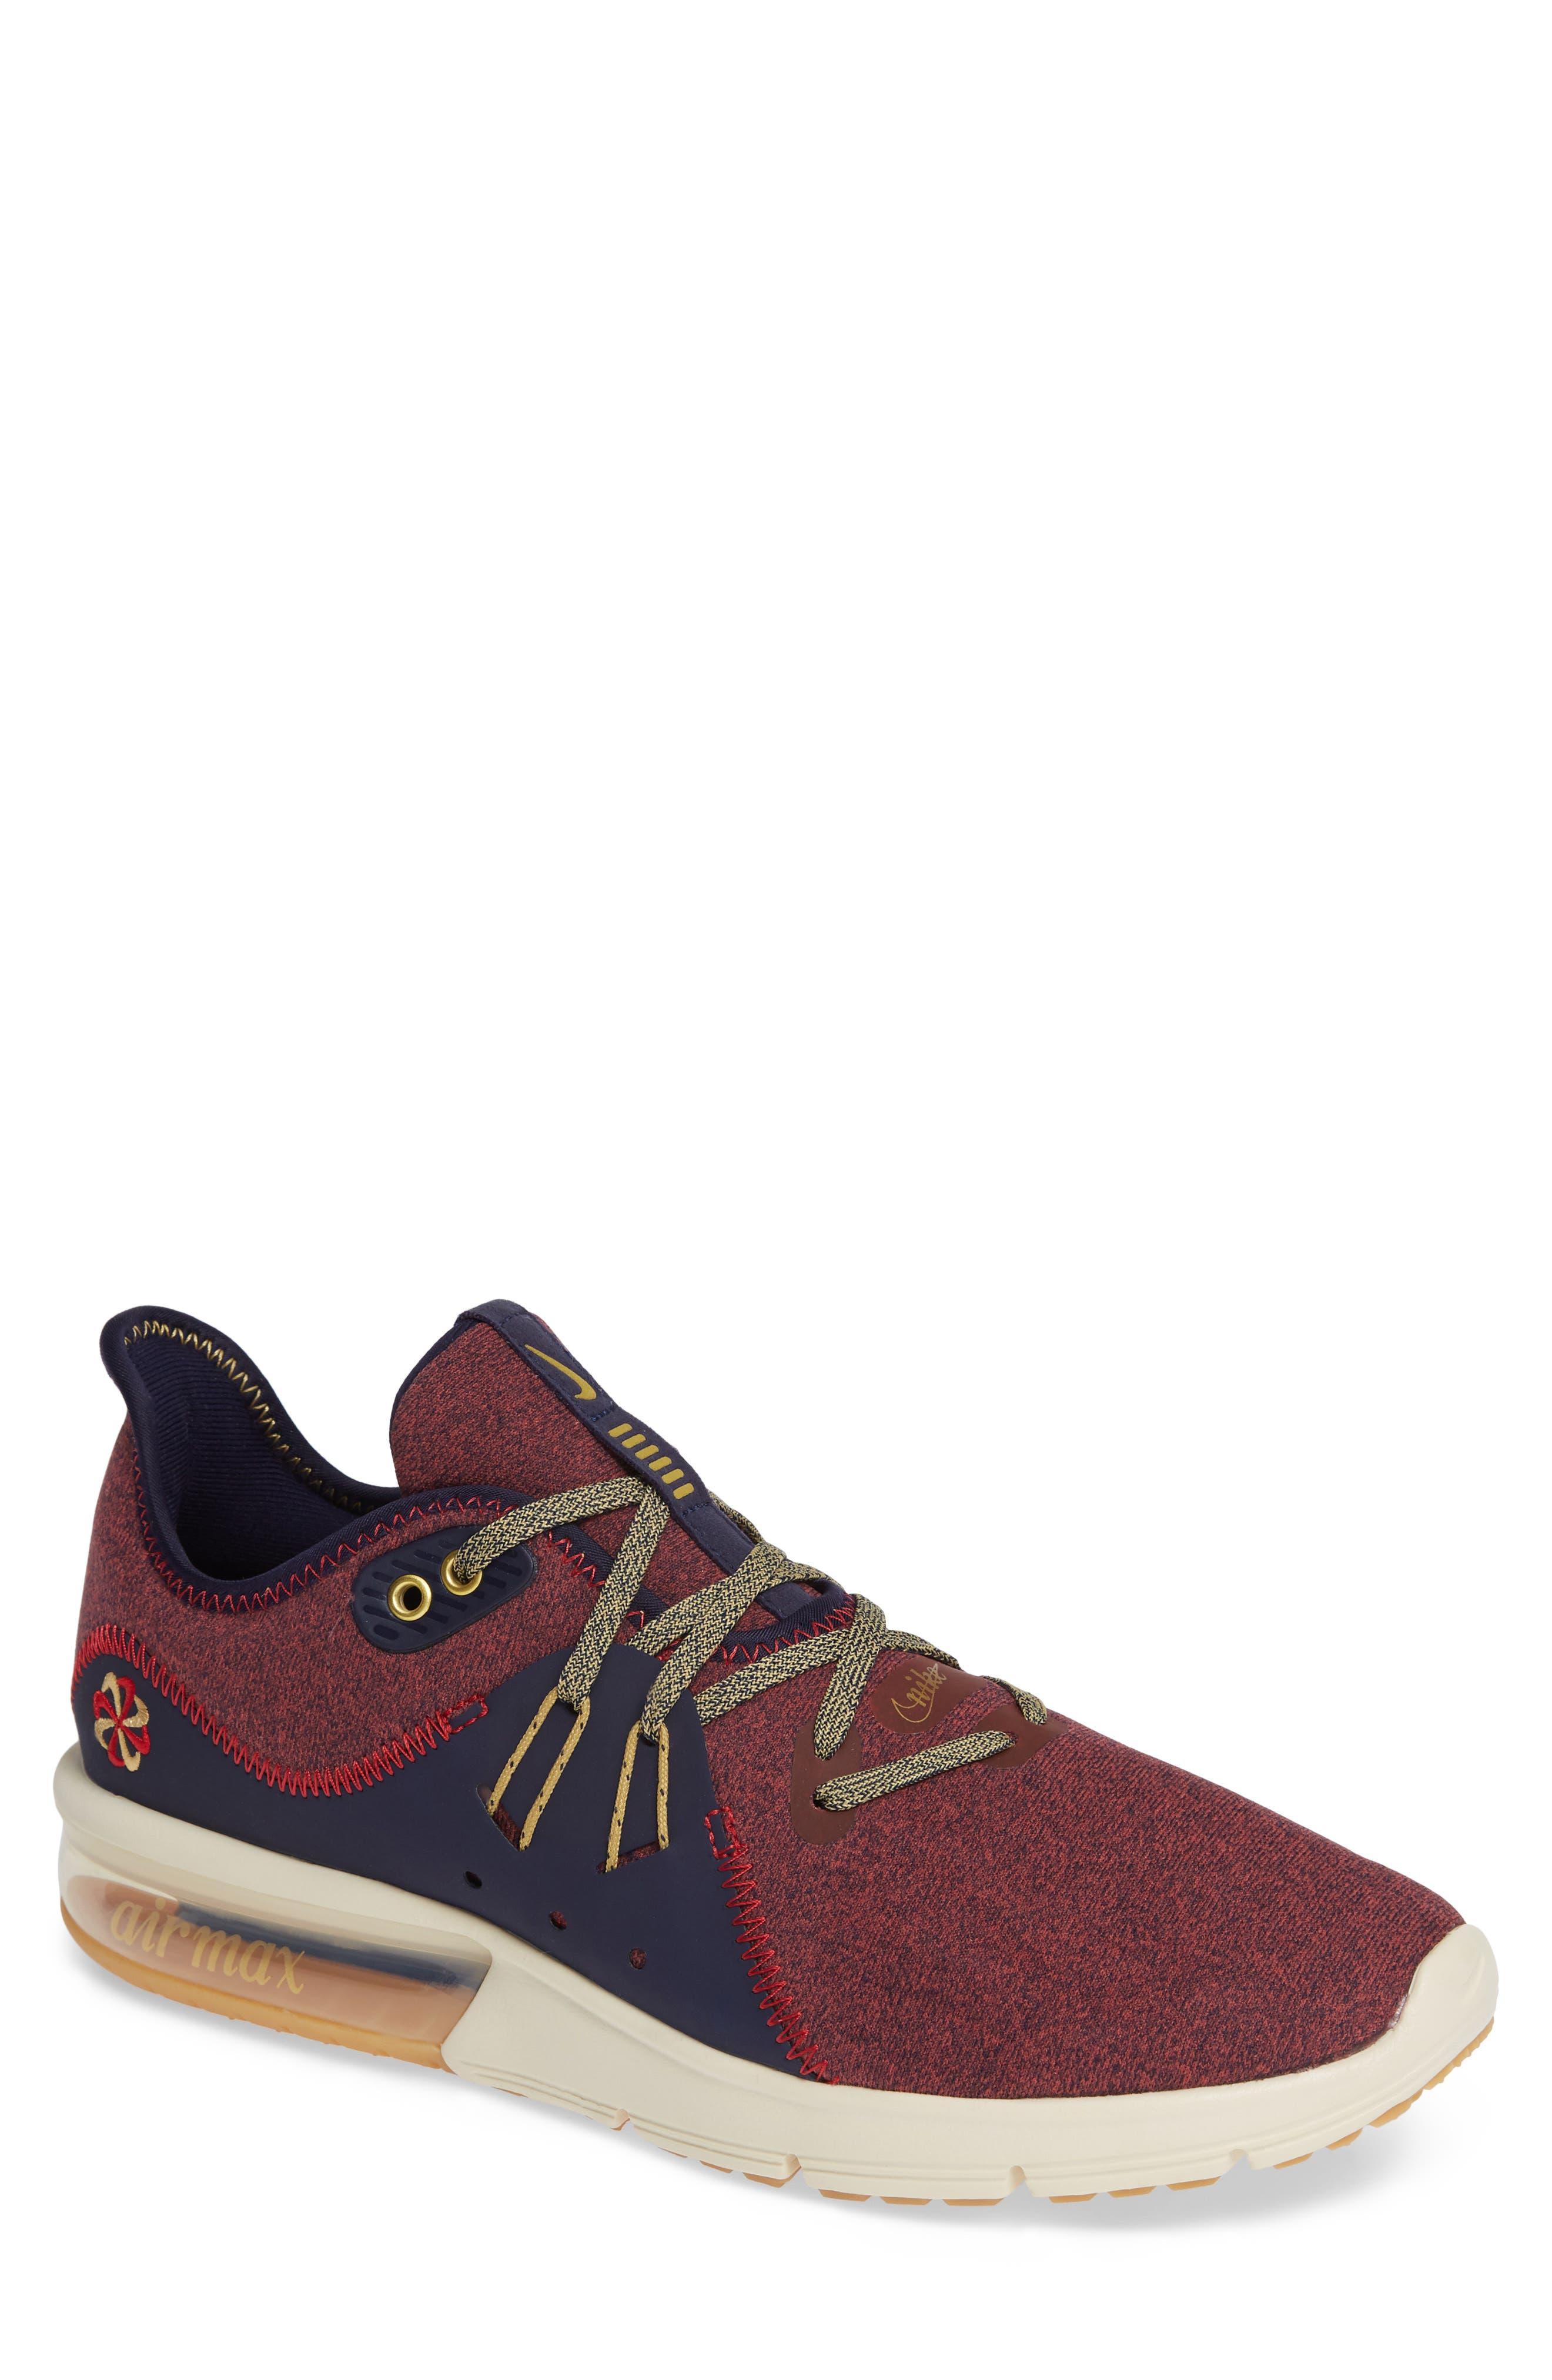 Air Max Sequent 3 PRM VST Sneaker,                             Main thumbnail 1, color,                             600